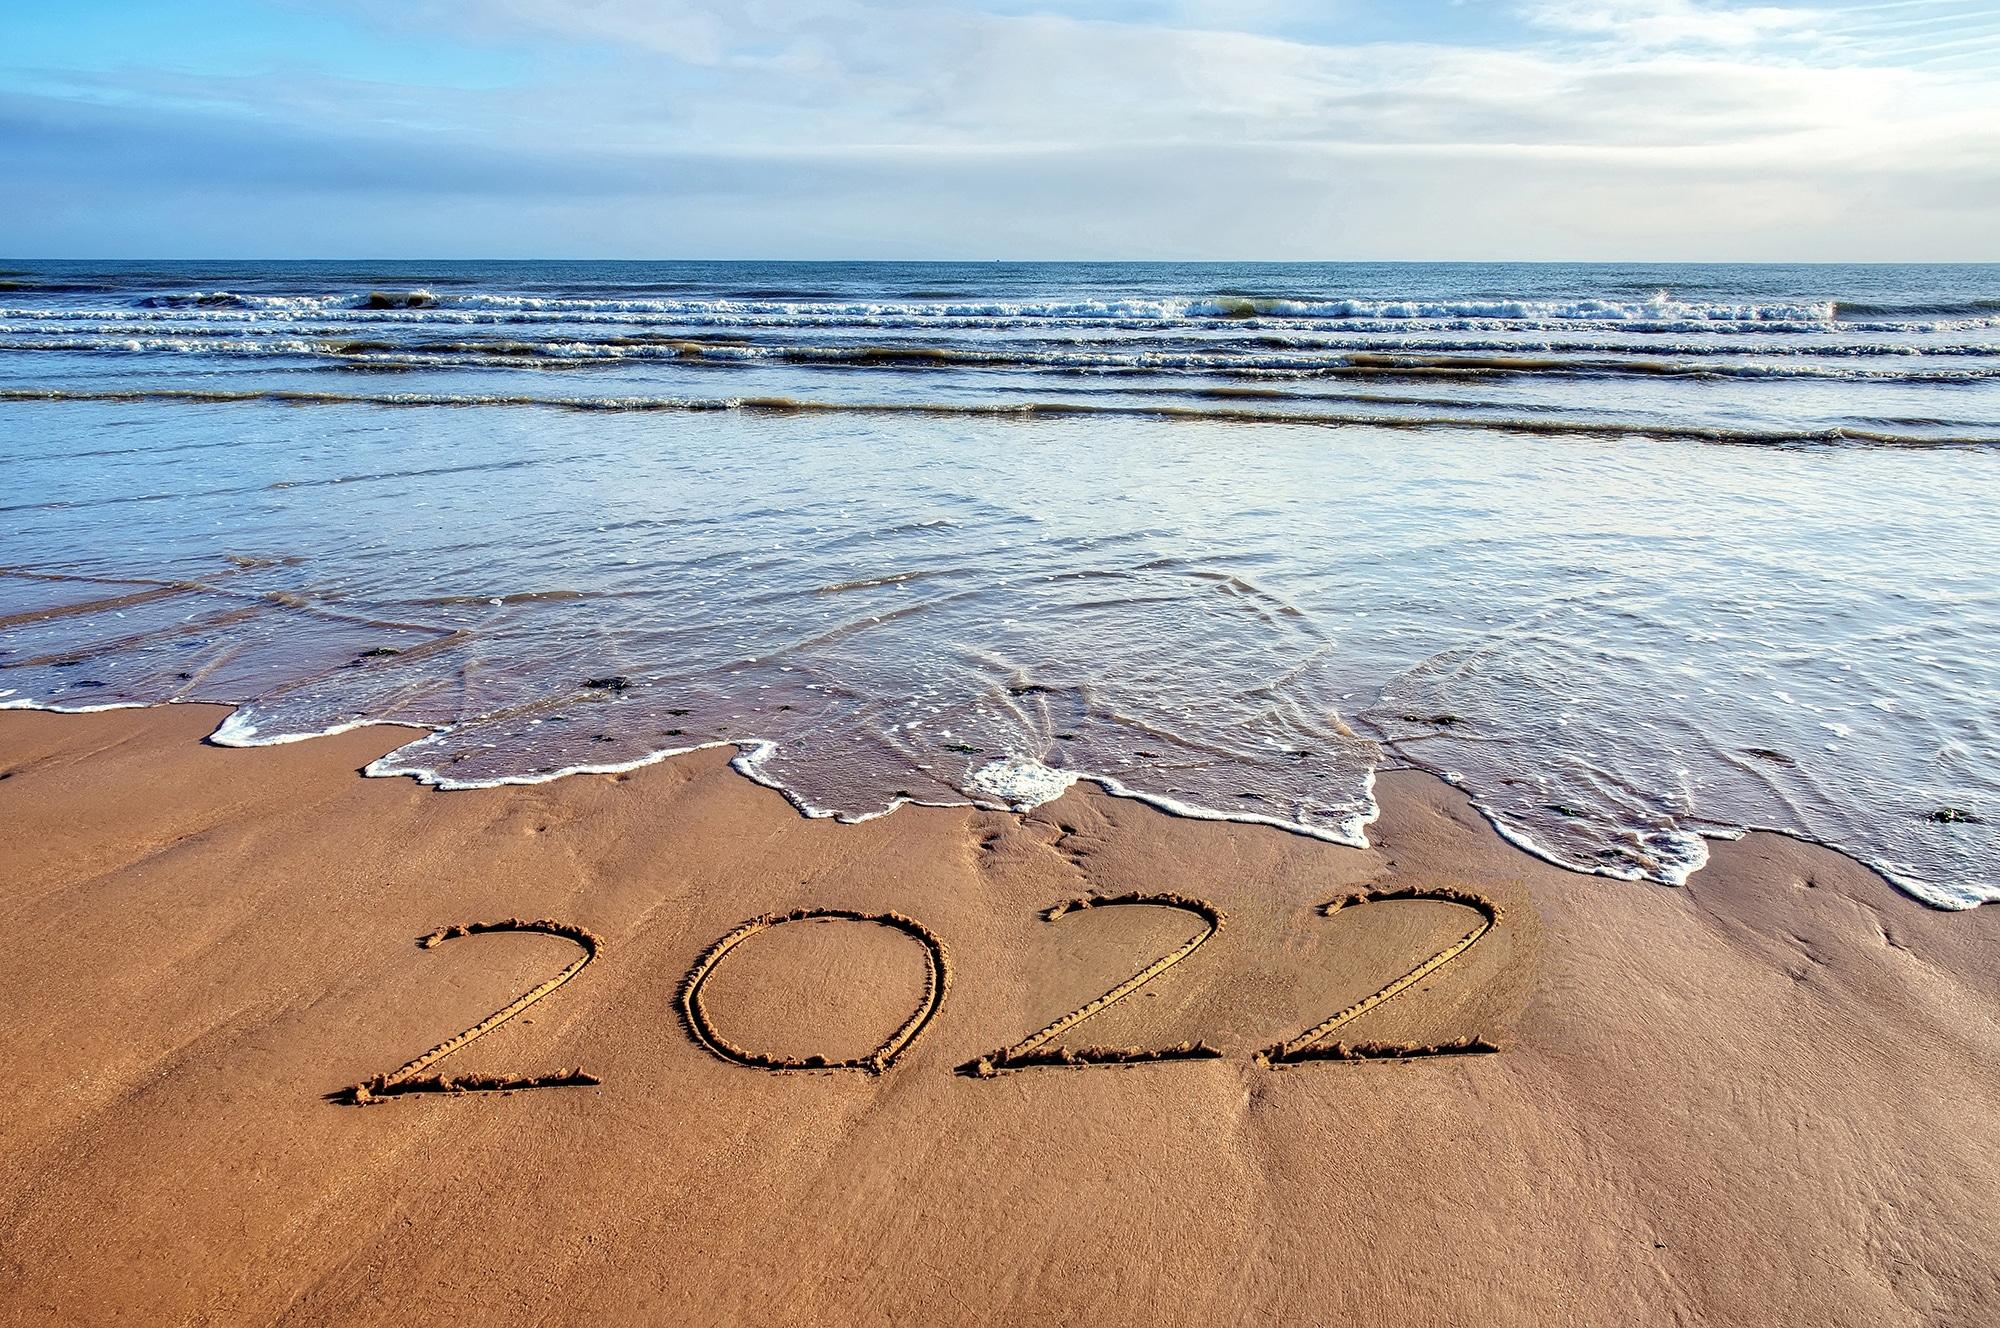 XIII Congreso Internacional AEDyR 2022